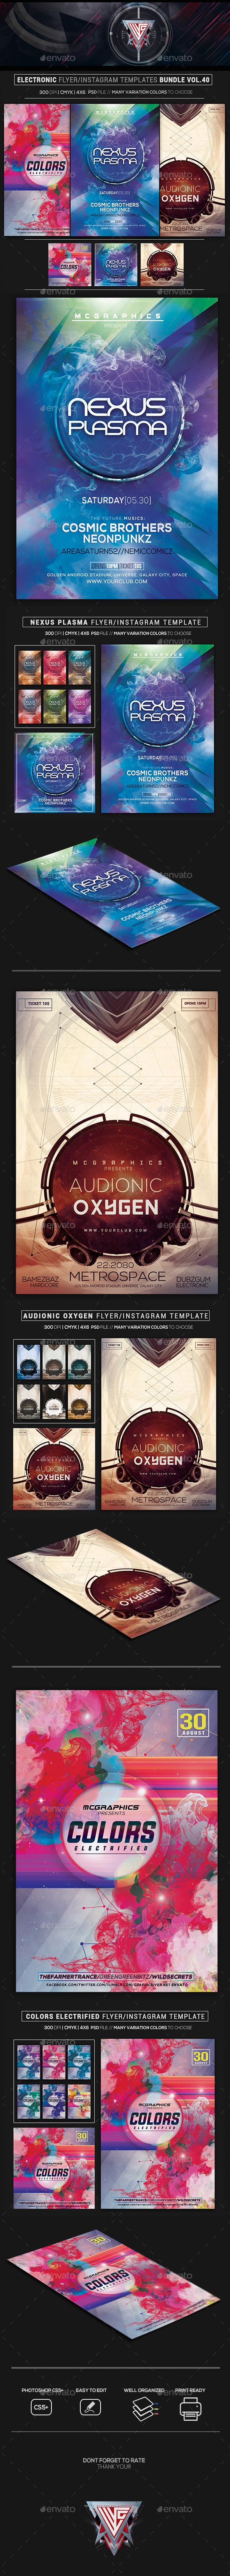 Electro Music Flyer/Instagram Bundle Vol. 50 - Flyers Print Templates